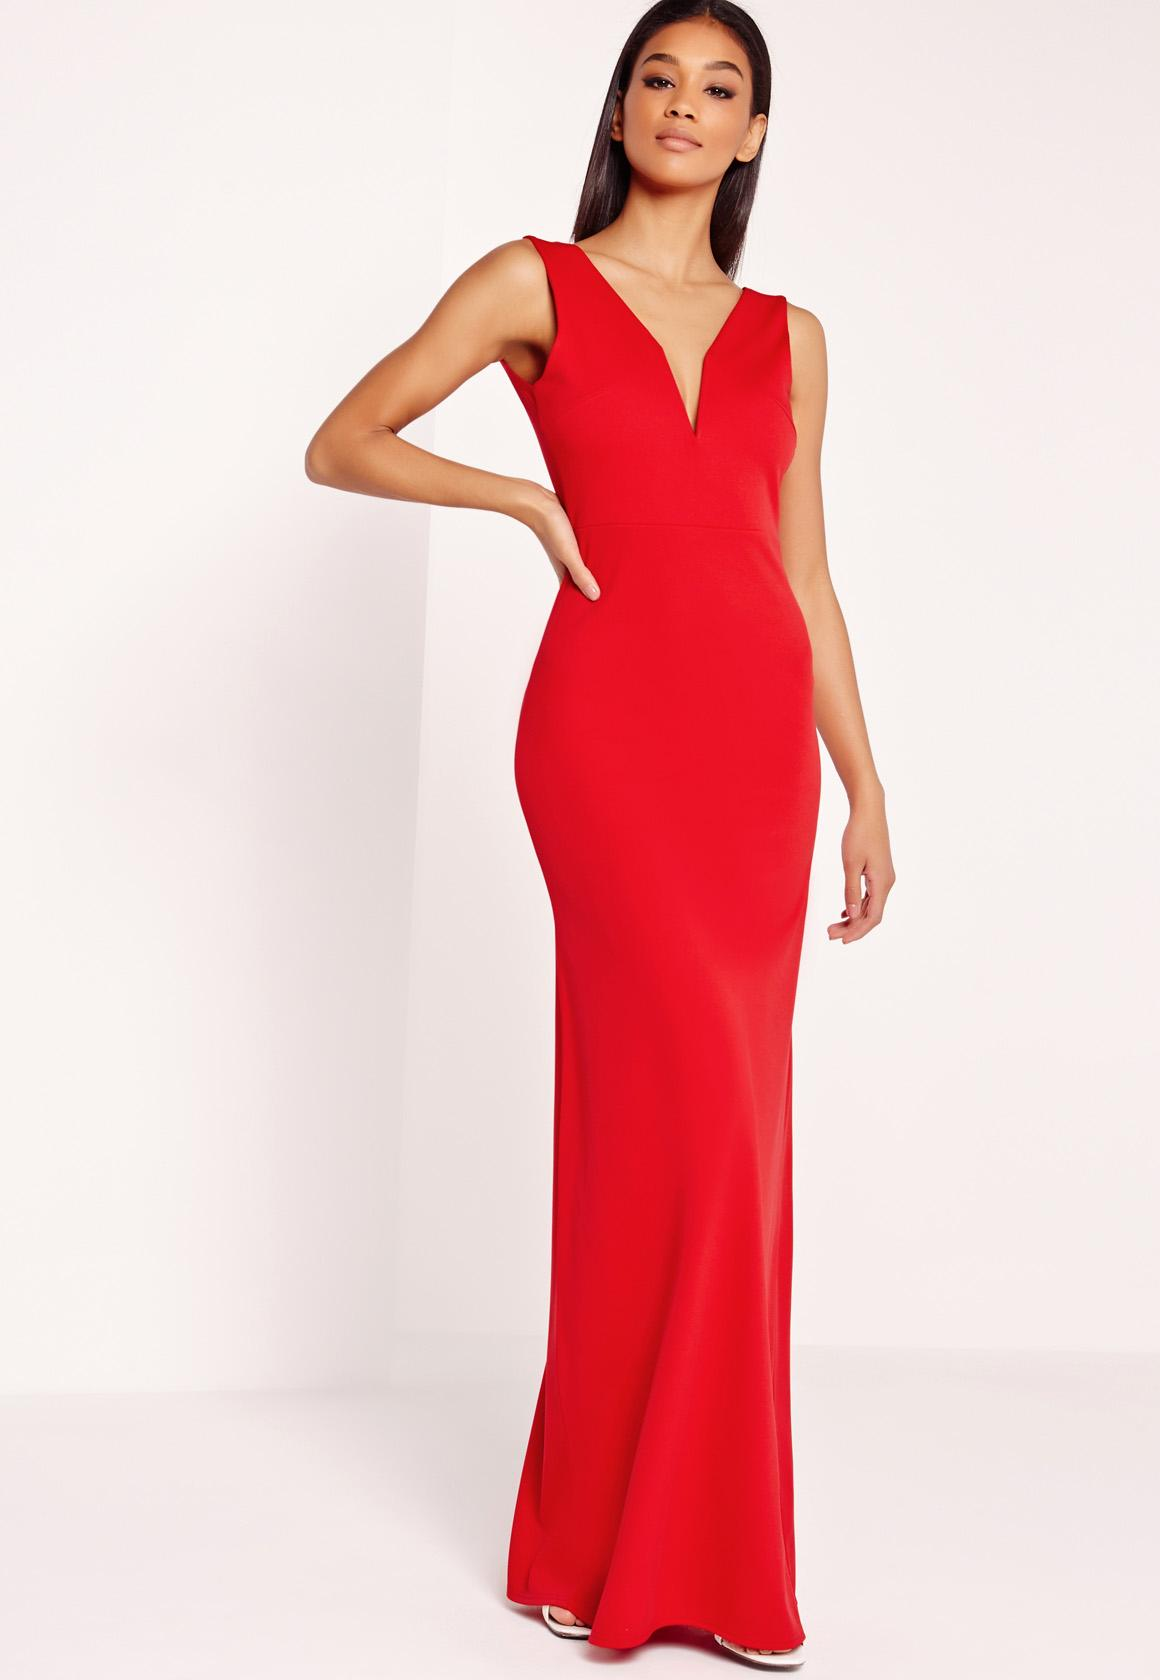 Kleid rot abend